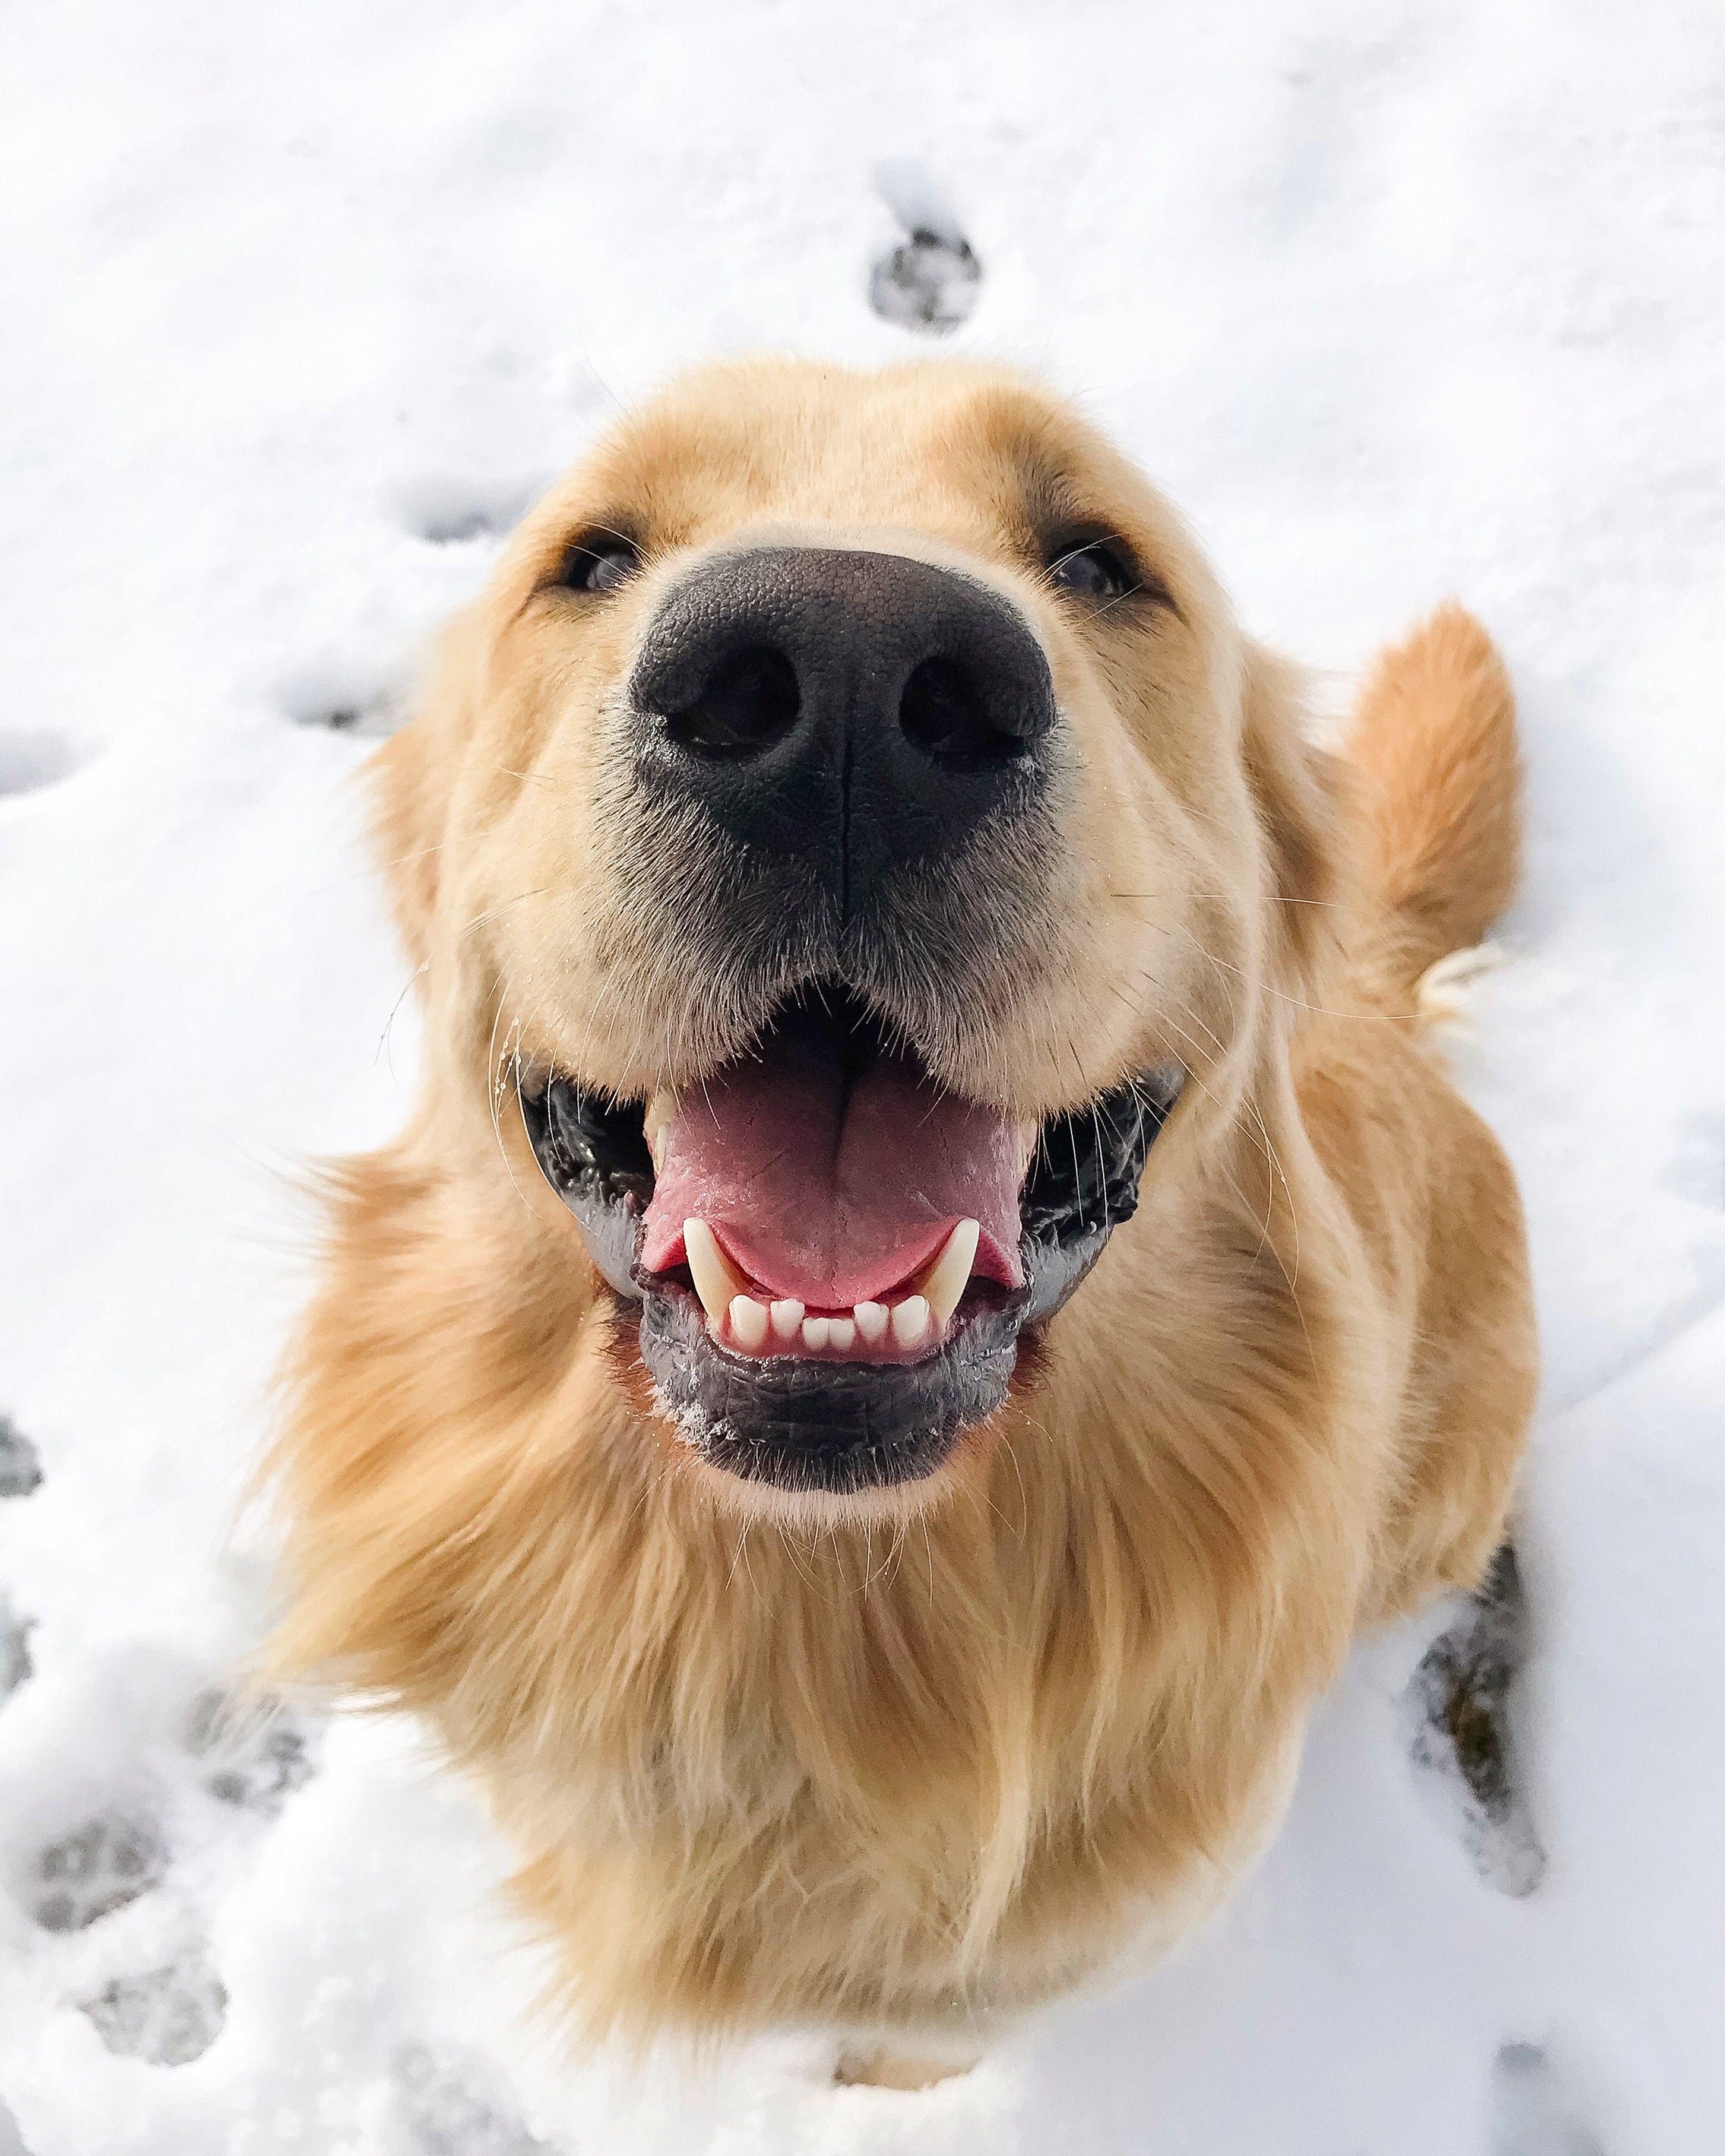 Golden Retriever Joyful Jax With His Happy And Handsome Smile